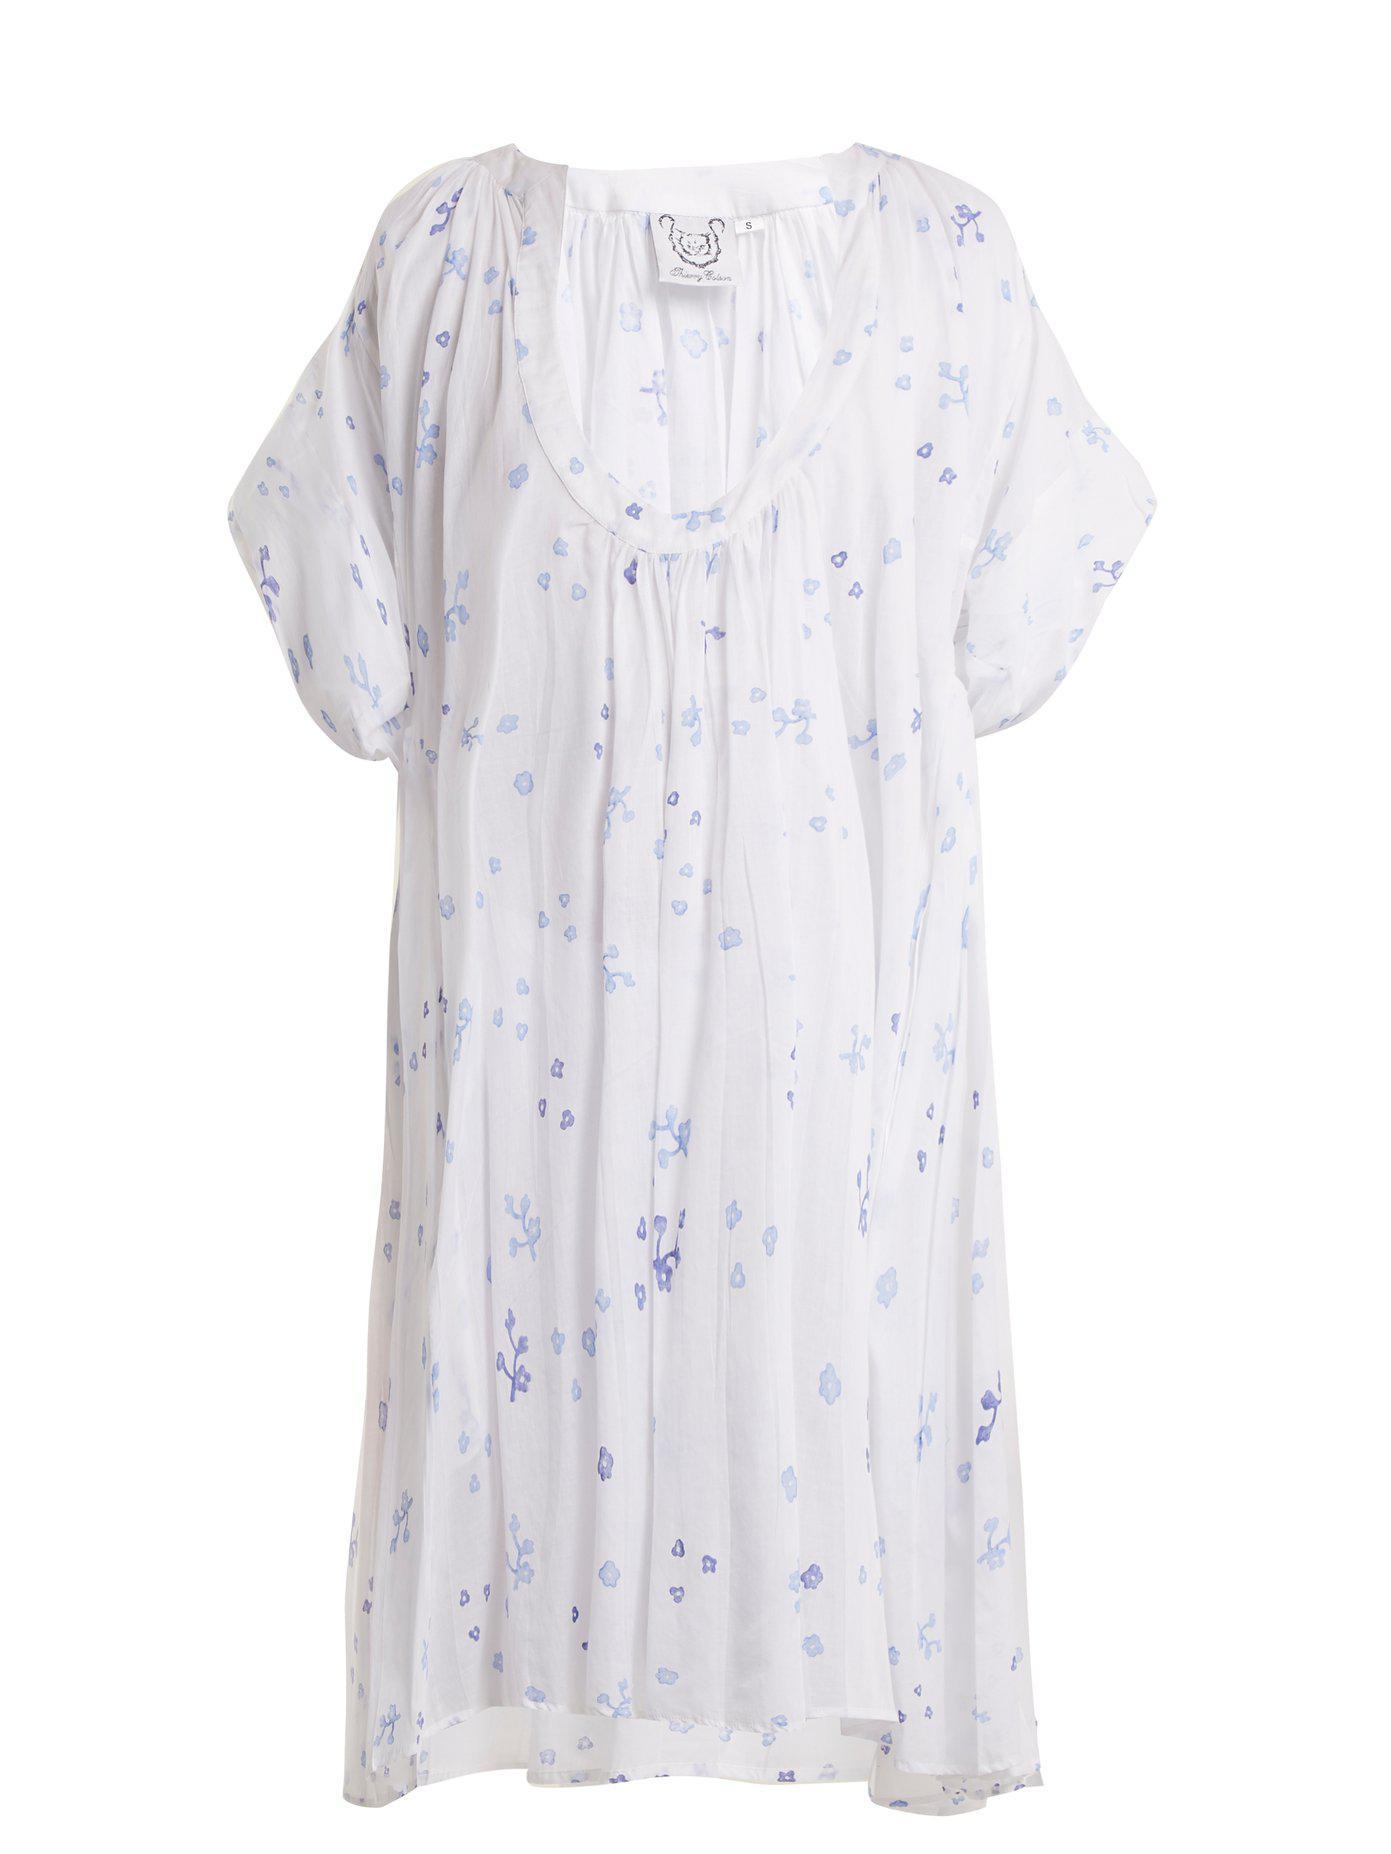 Shanta floral-print cotton dress Thierry Colson Discount Newest GJnUodszz